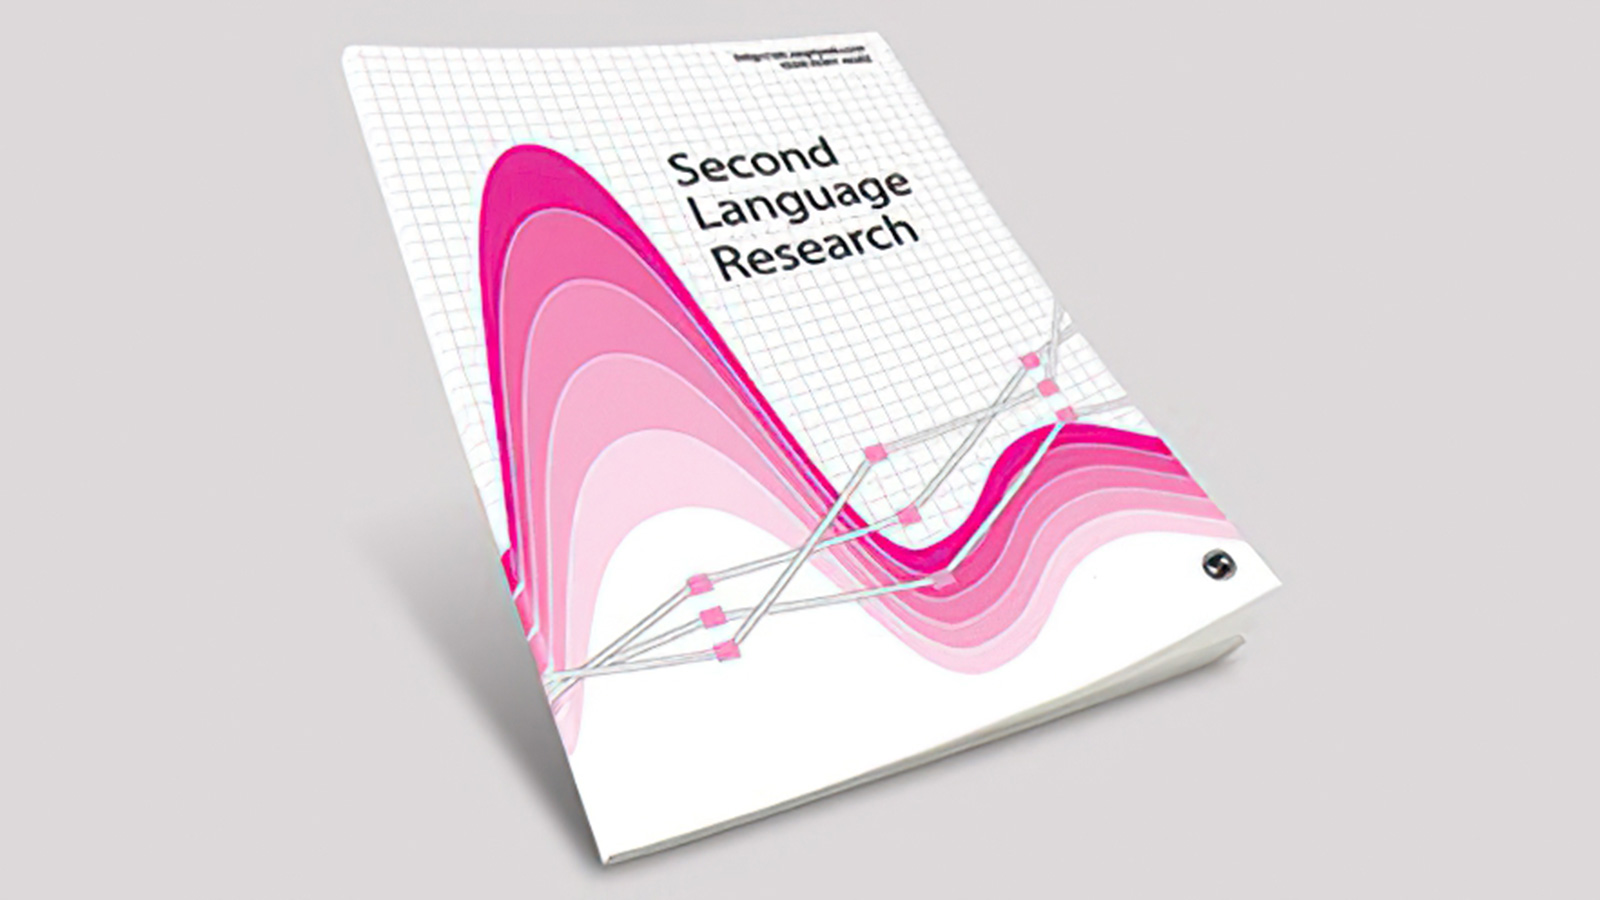 Second Language Research publication graphic